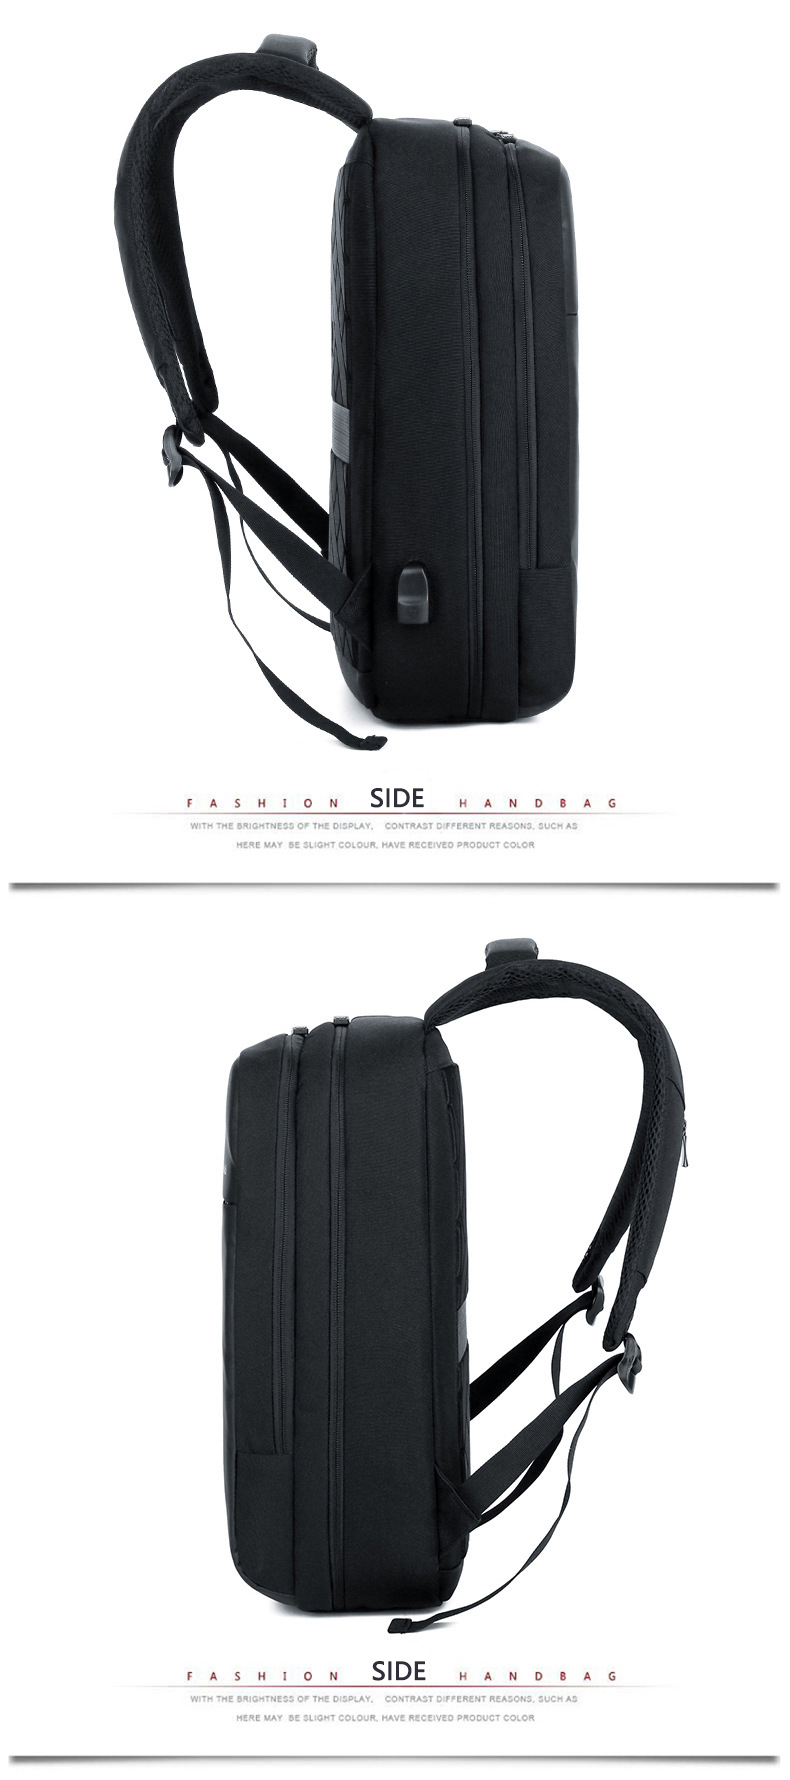 HTB188gQXN rK1RkHFqDq6yJAFXac - Mens 15.6 inch Laptop Business Backpacks Waterproof Male Travel